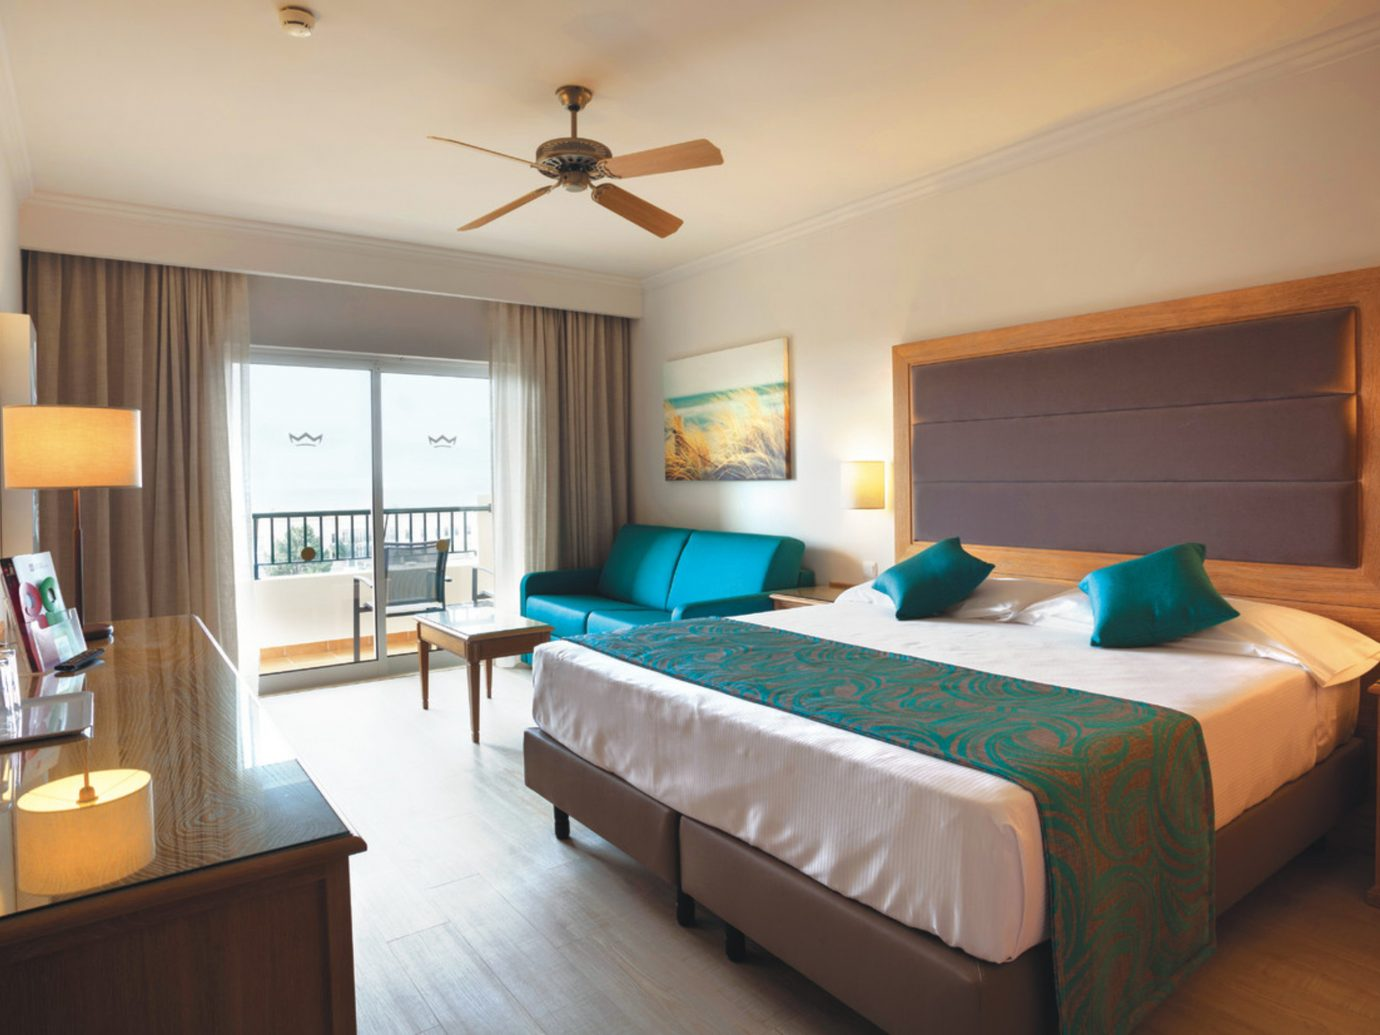 All-Inclusive Resorts Hotels floor indoor wall ceiling bed Bedroom room Suite interior design real estate hotel green estate Resort area furniture